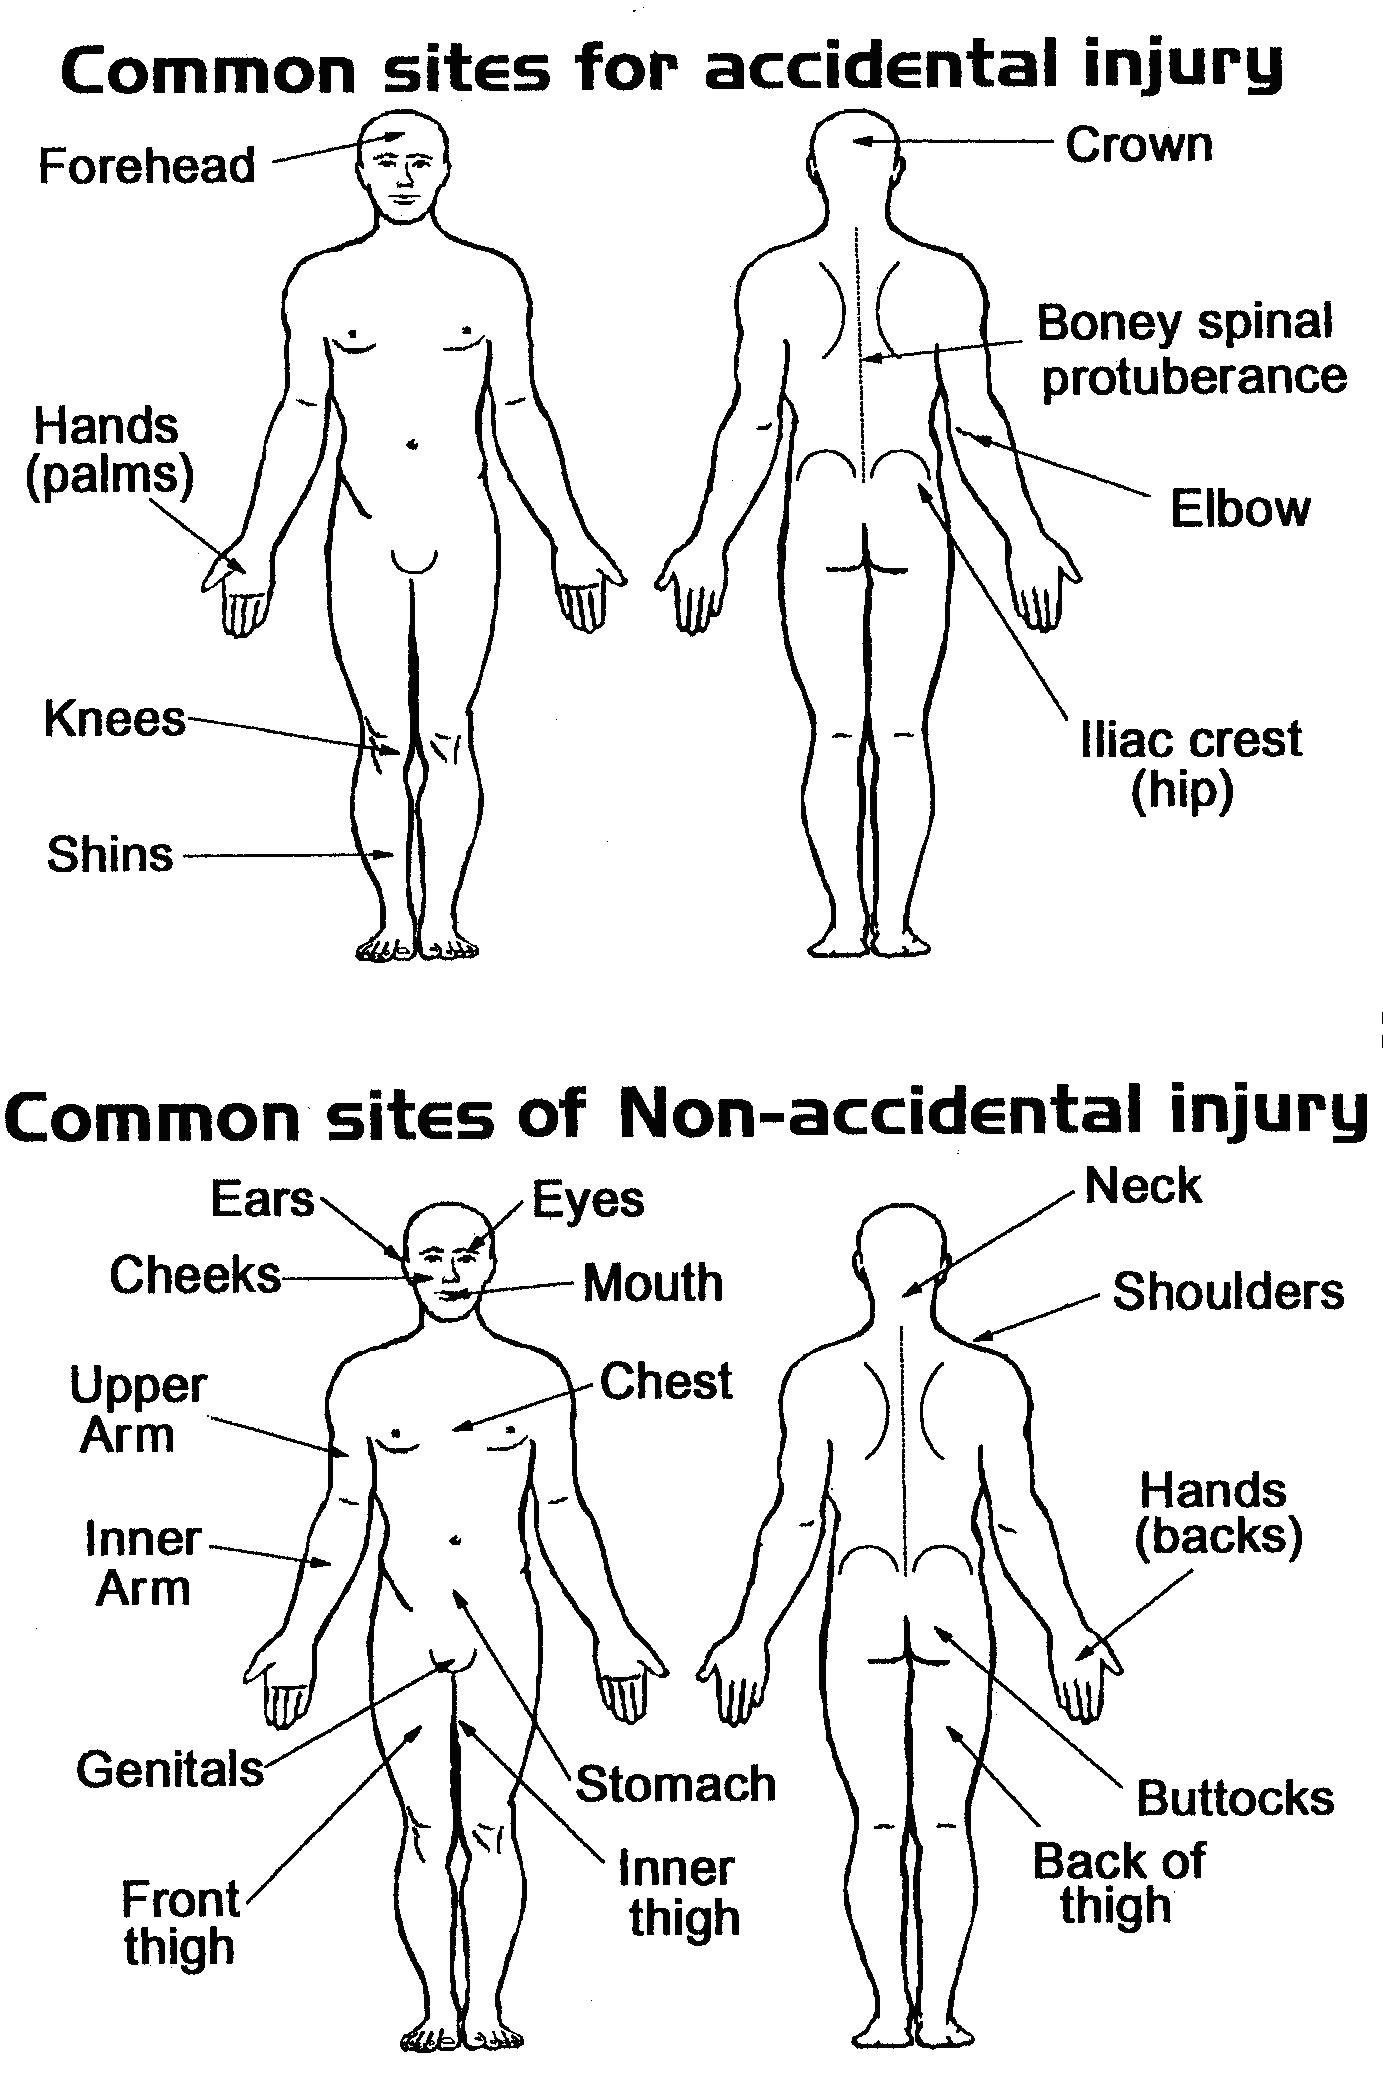 Body Diagrams For Charting Injury ImageResizerTool Com